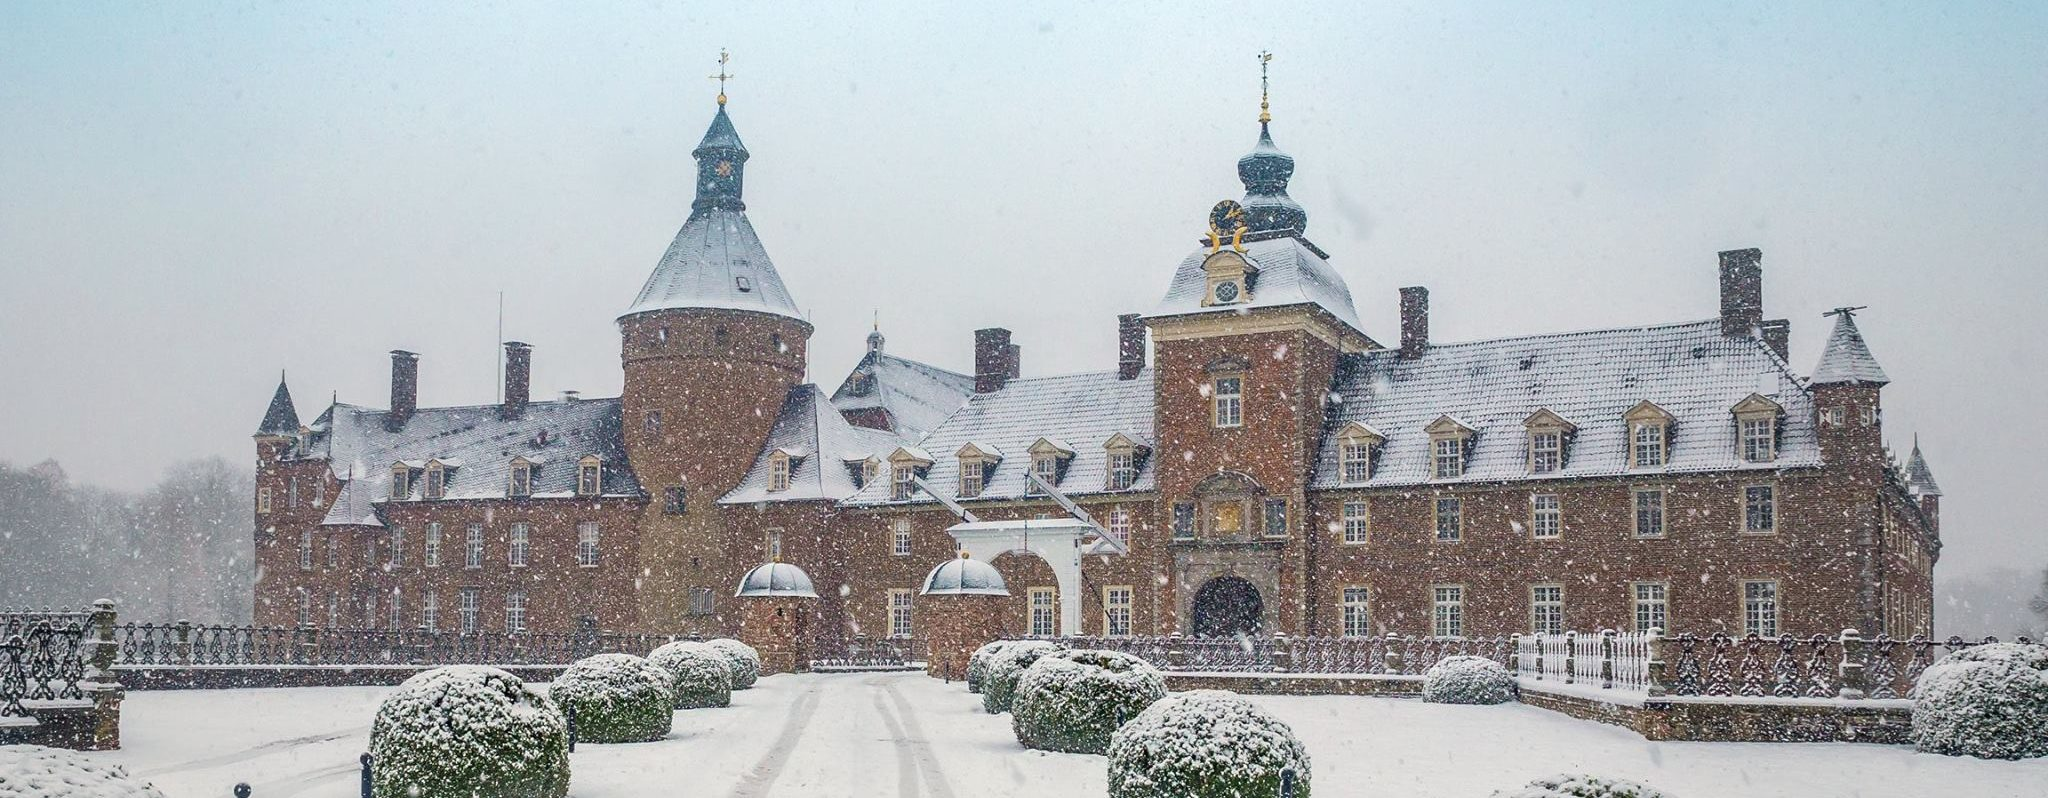 Schloss Anholt im Winter